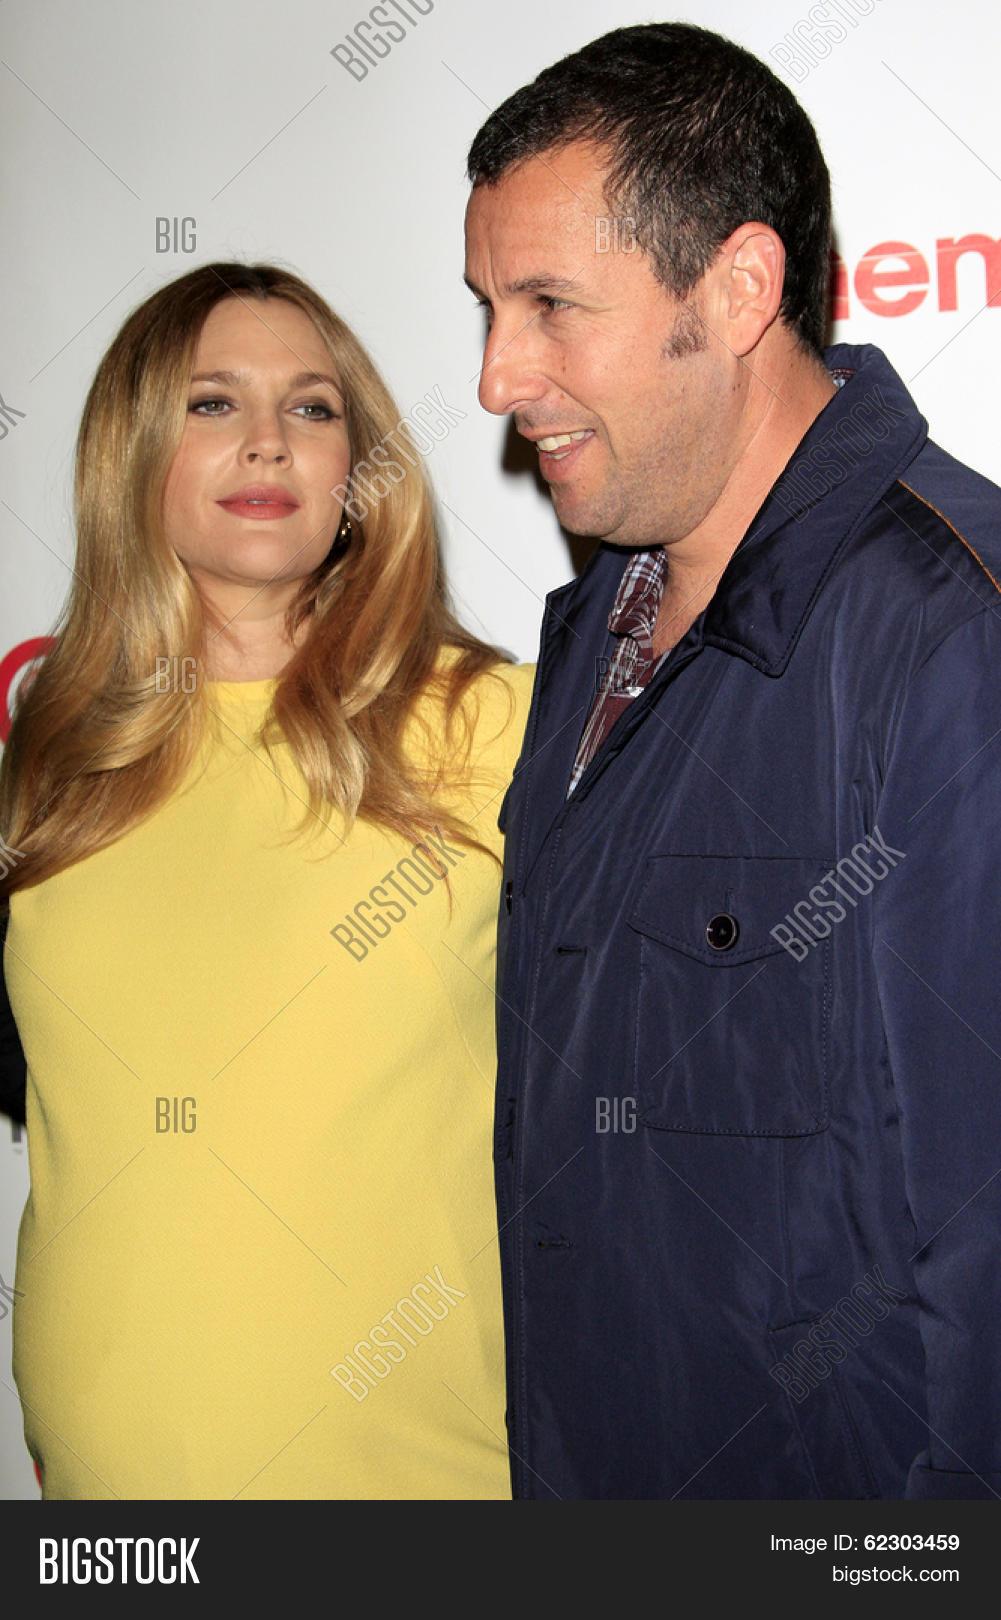 Drew Barrymore dating 2014 Dating nya södra Wales